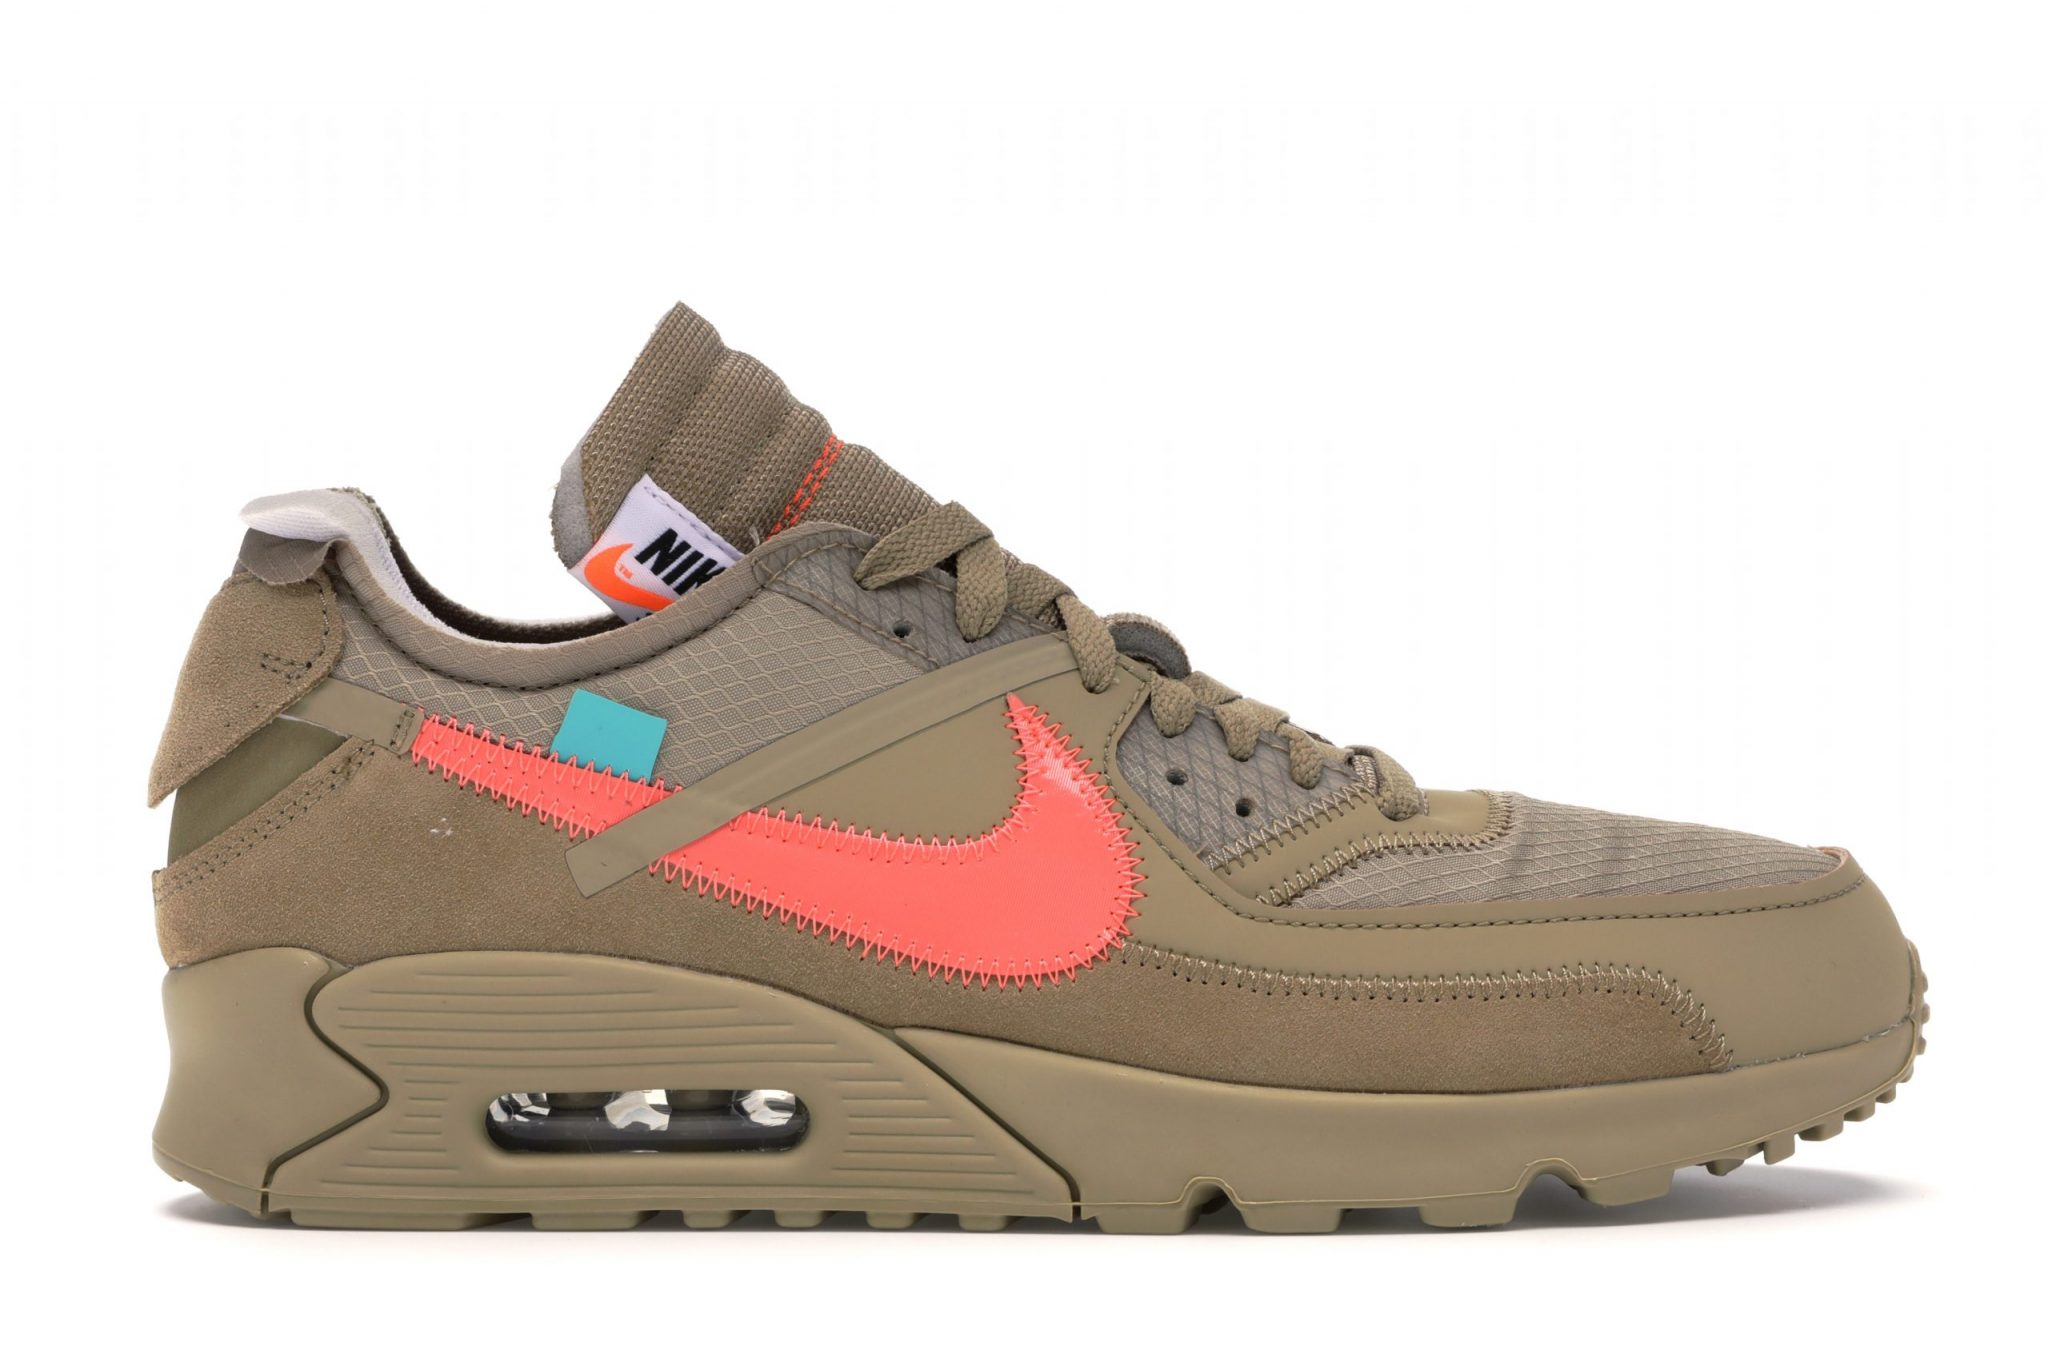 Nike-Air-Max-90-Off-White-Desert-Ore_01